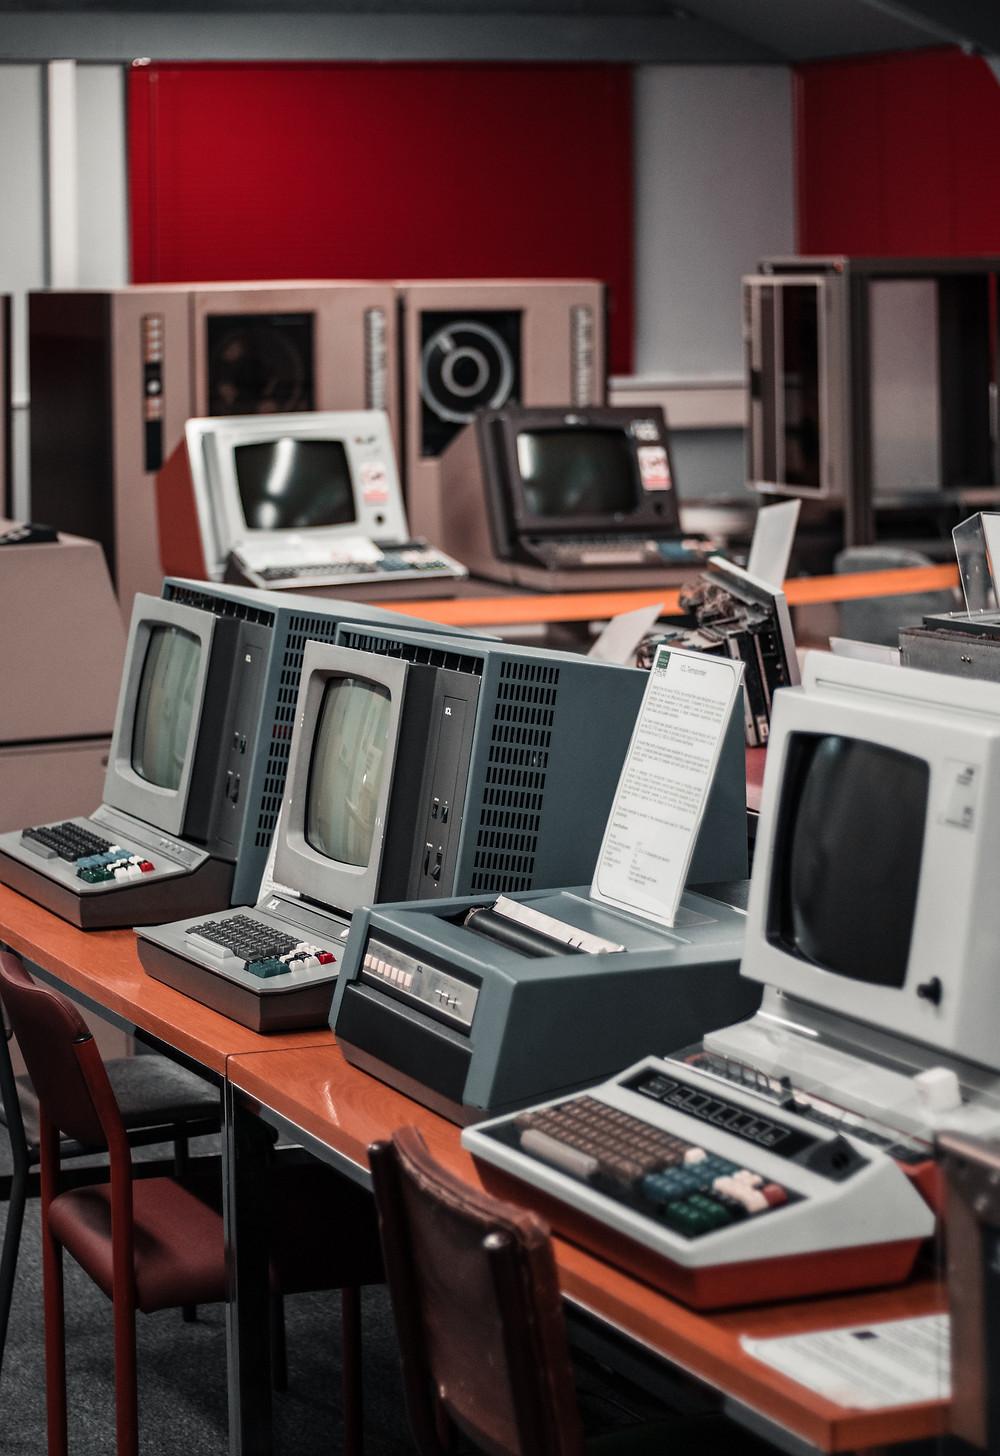 Old desktop PCs on display.